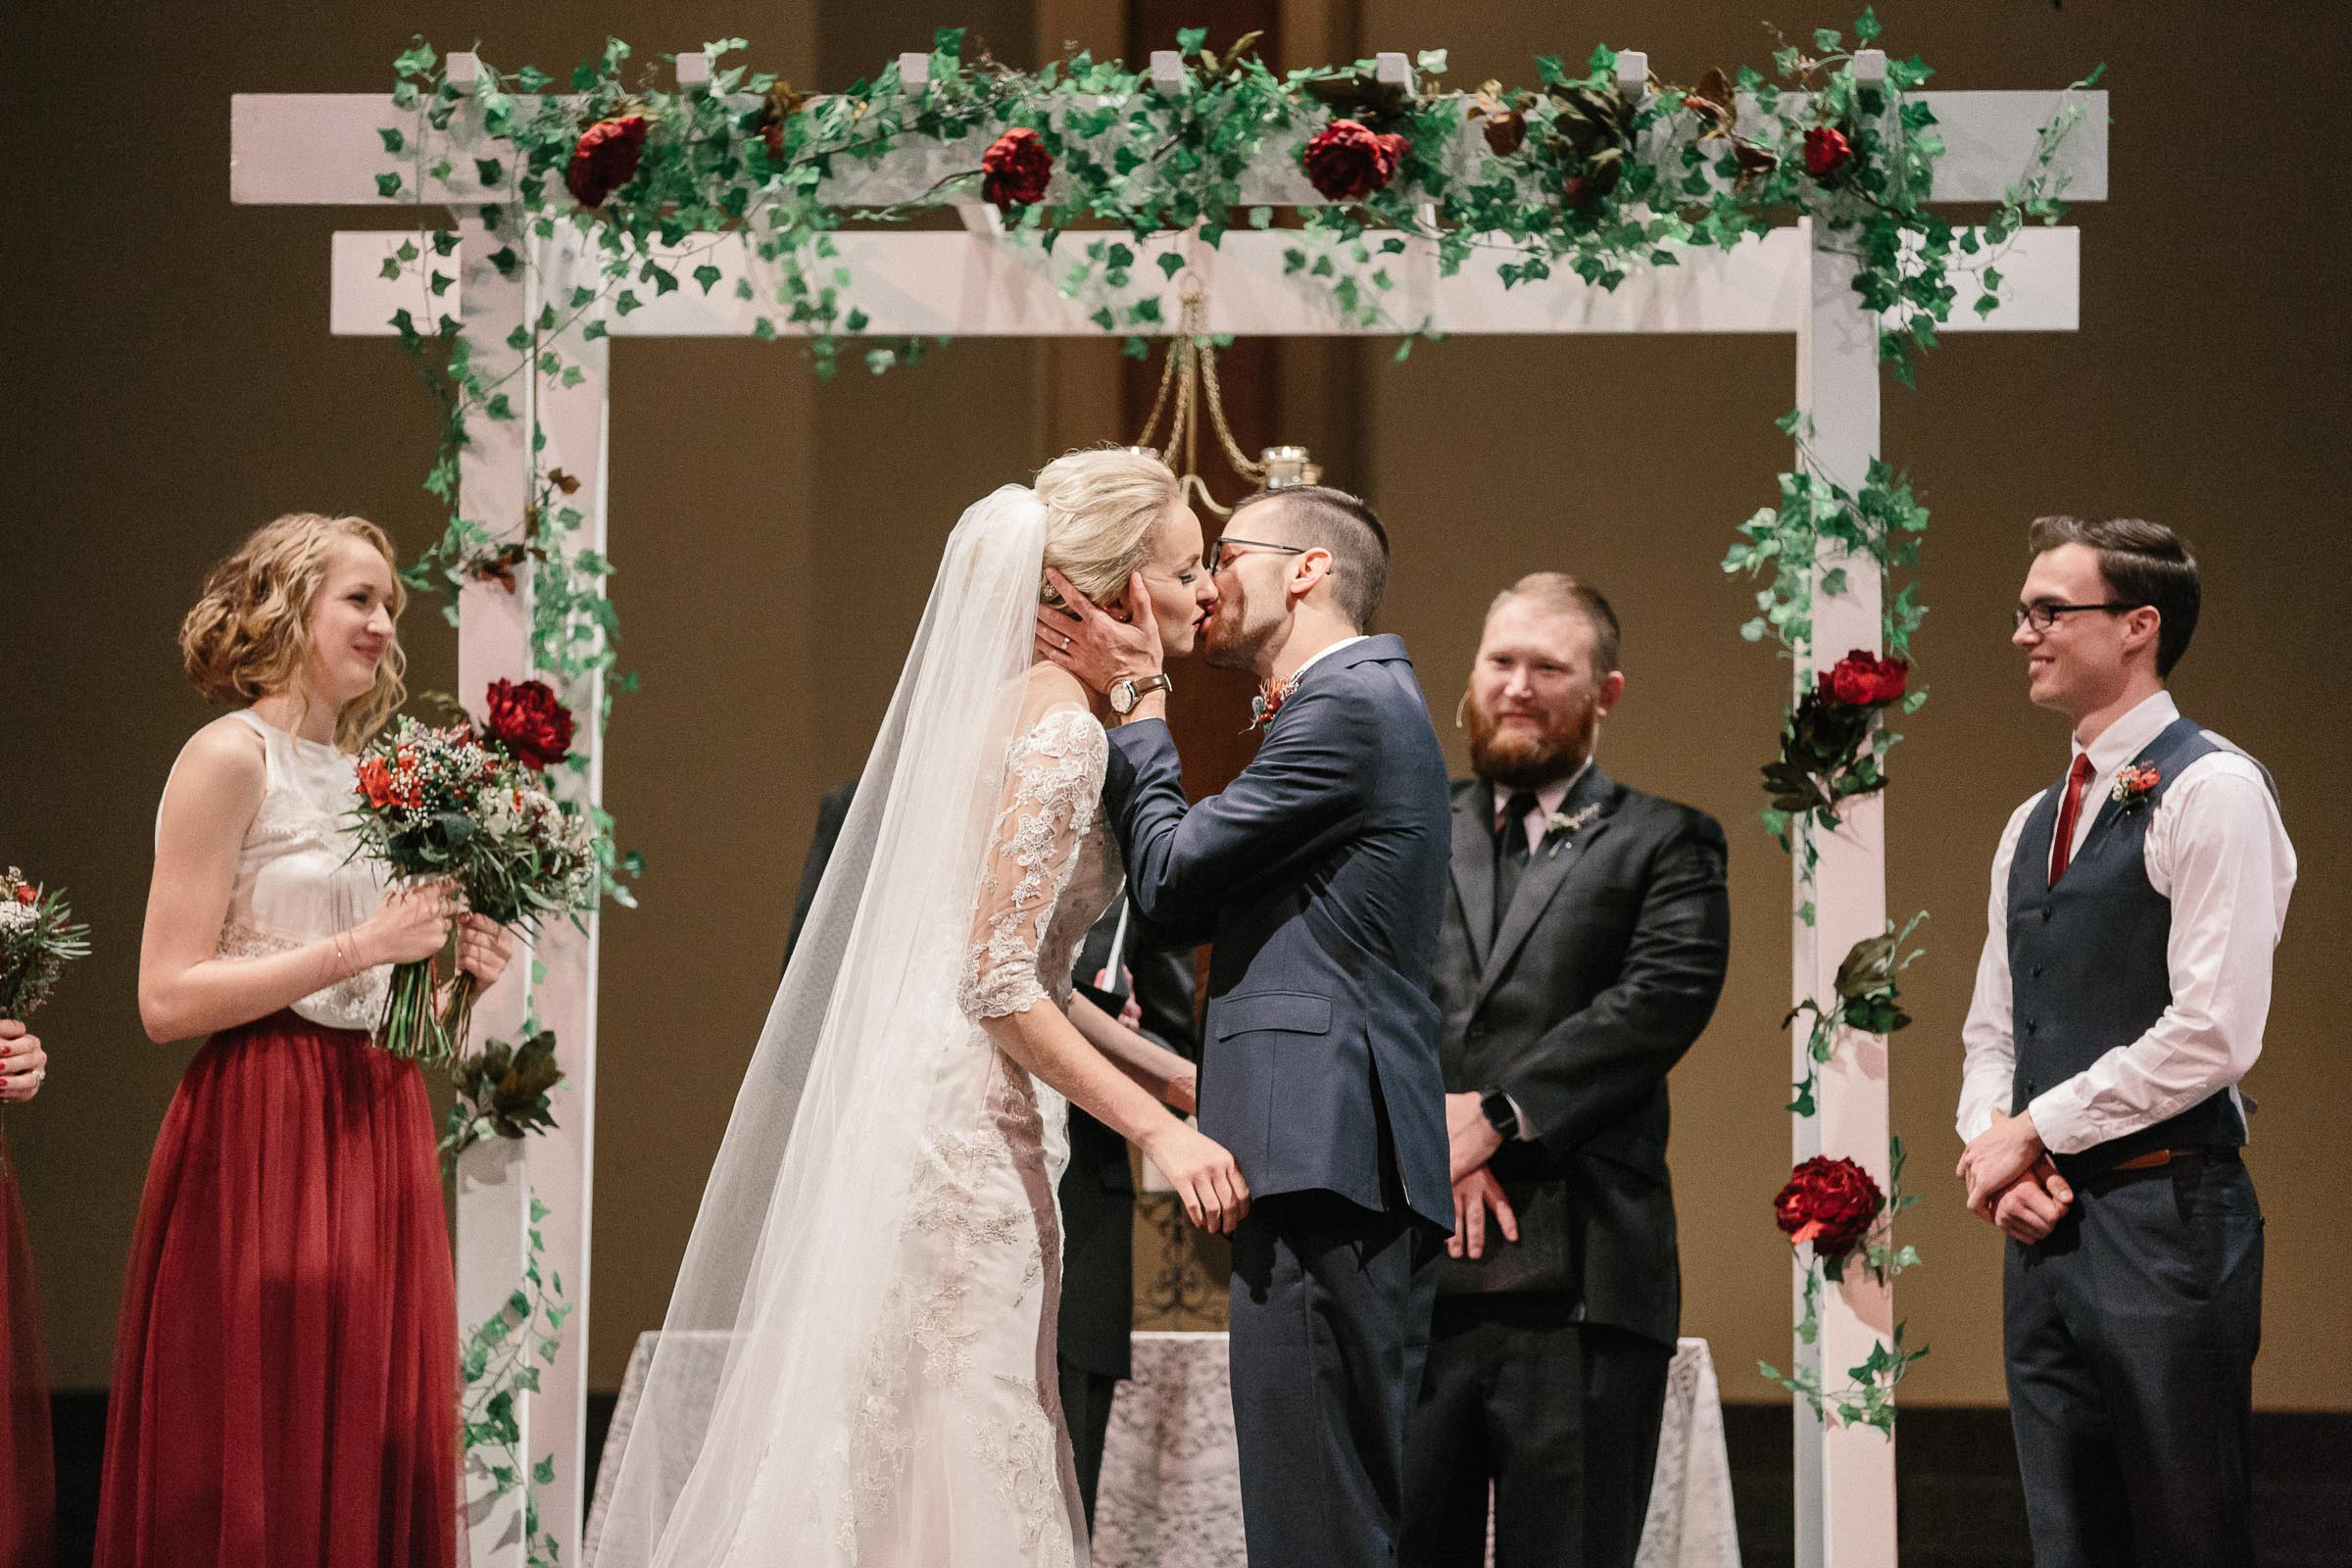 Jenna&Austin_SiouxFalls_Wedding_Photographer_079.jpg